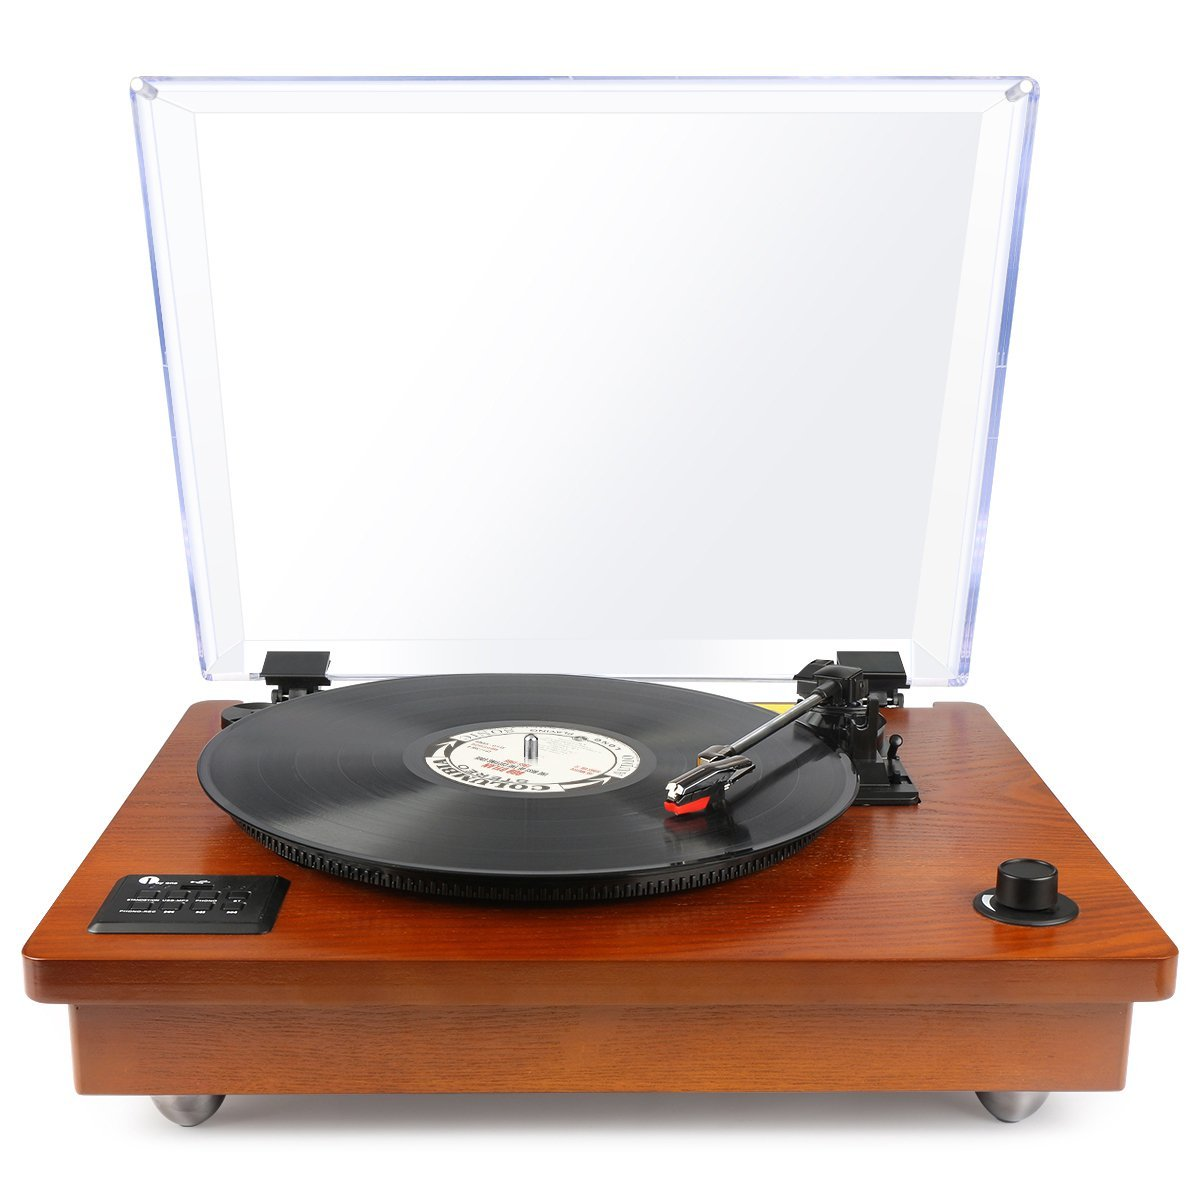 1byone Vintage Style Turntable